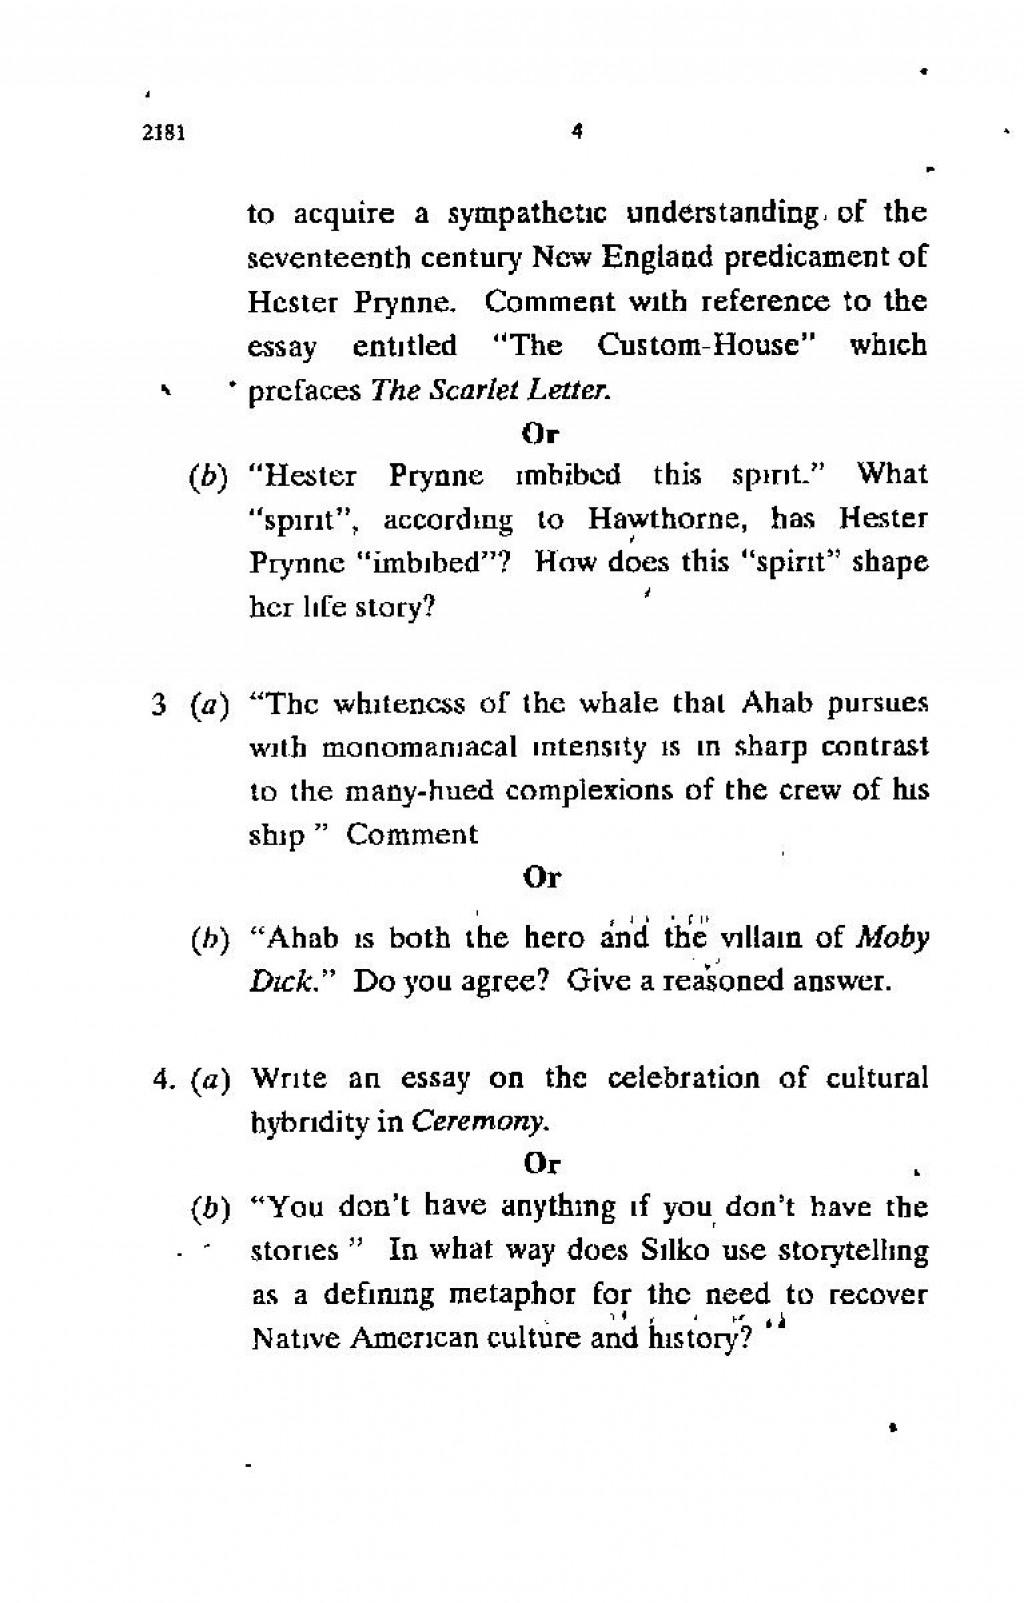 003 Essay Example Native American Questions American2bliterature Page Fantastic Art Topics Interesting Paper Culture Large